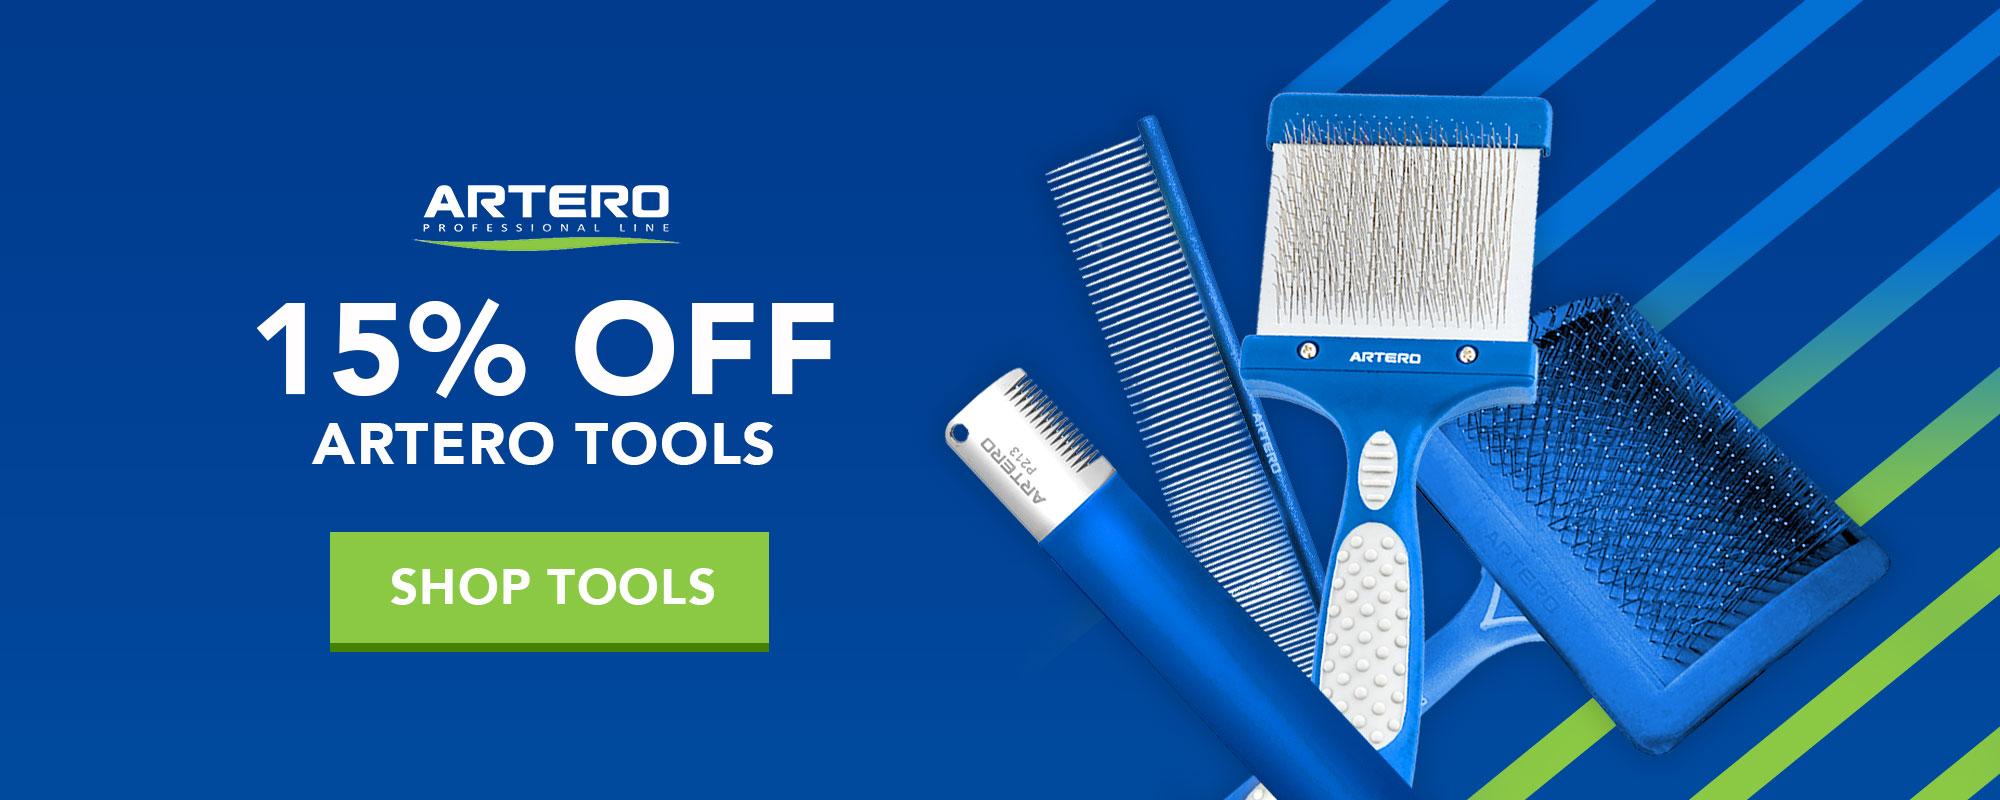 15% Off Artero Tools - Shop Now